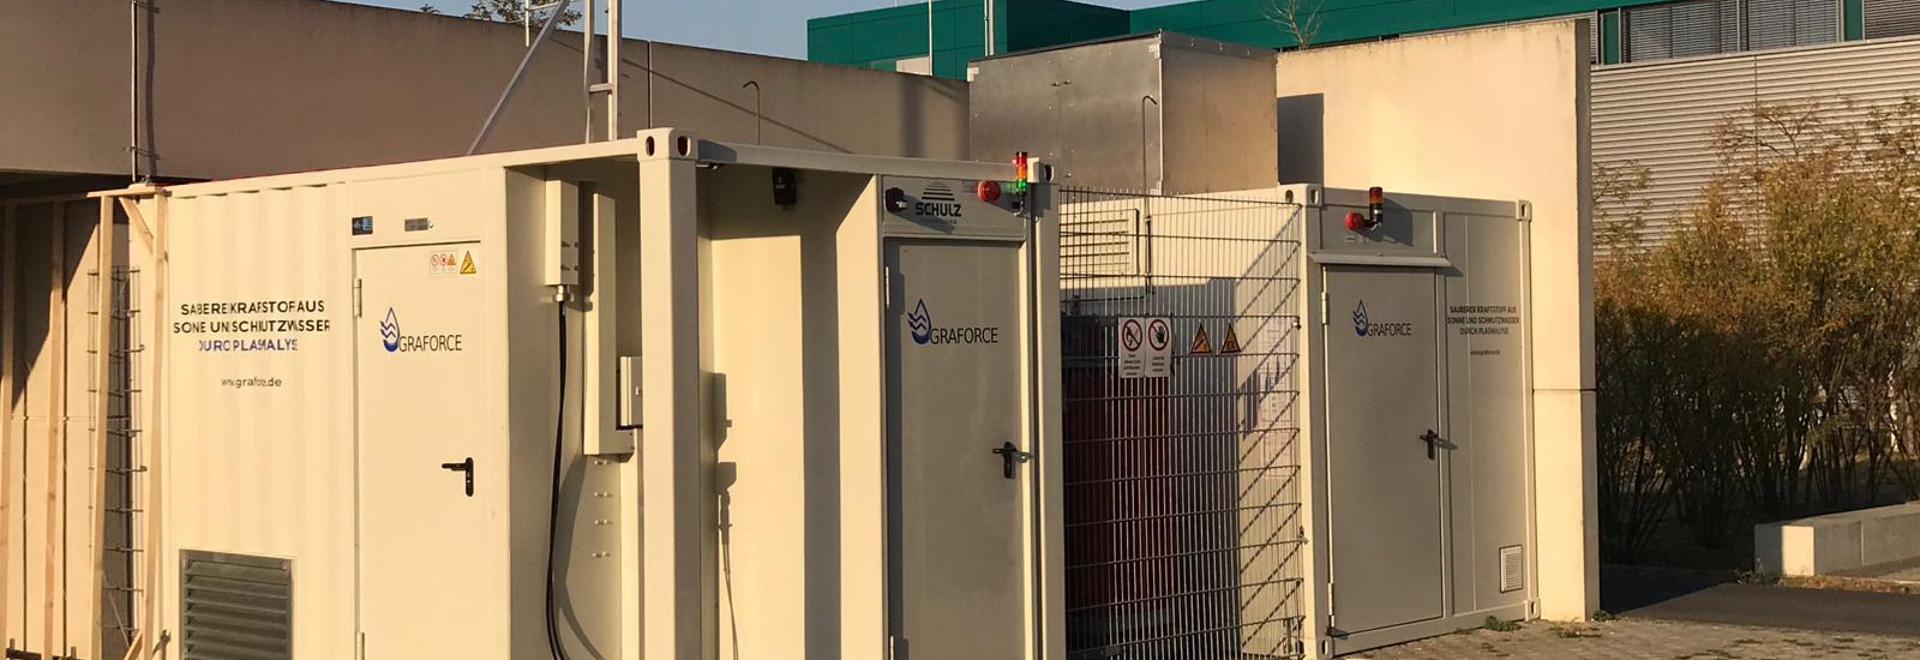 Graforce plasmalysis demo plant in Berlin-Adlershof (Photo: Business Wire)